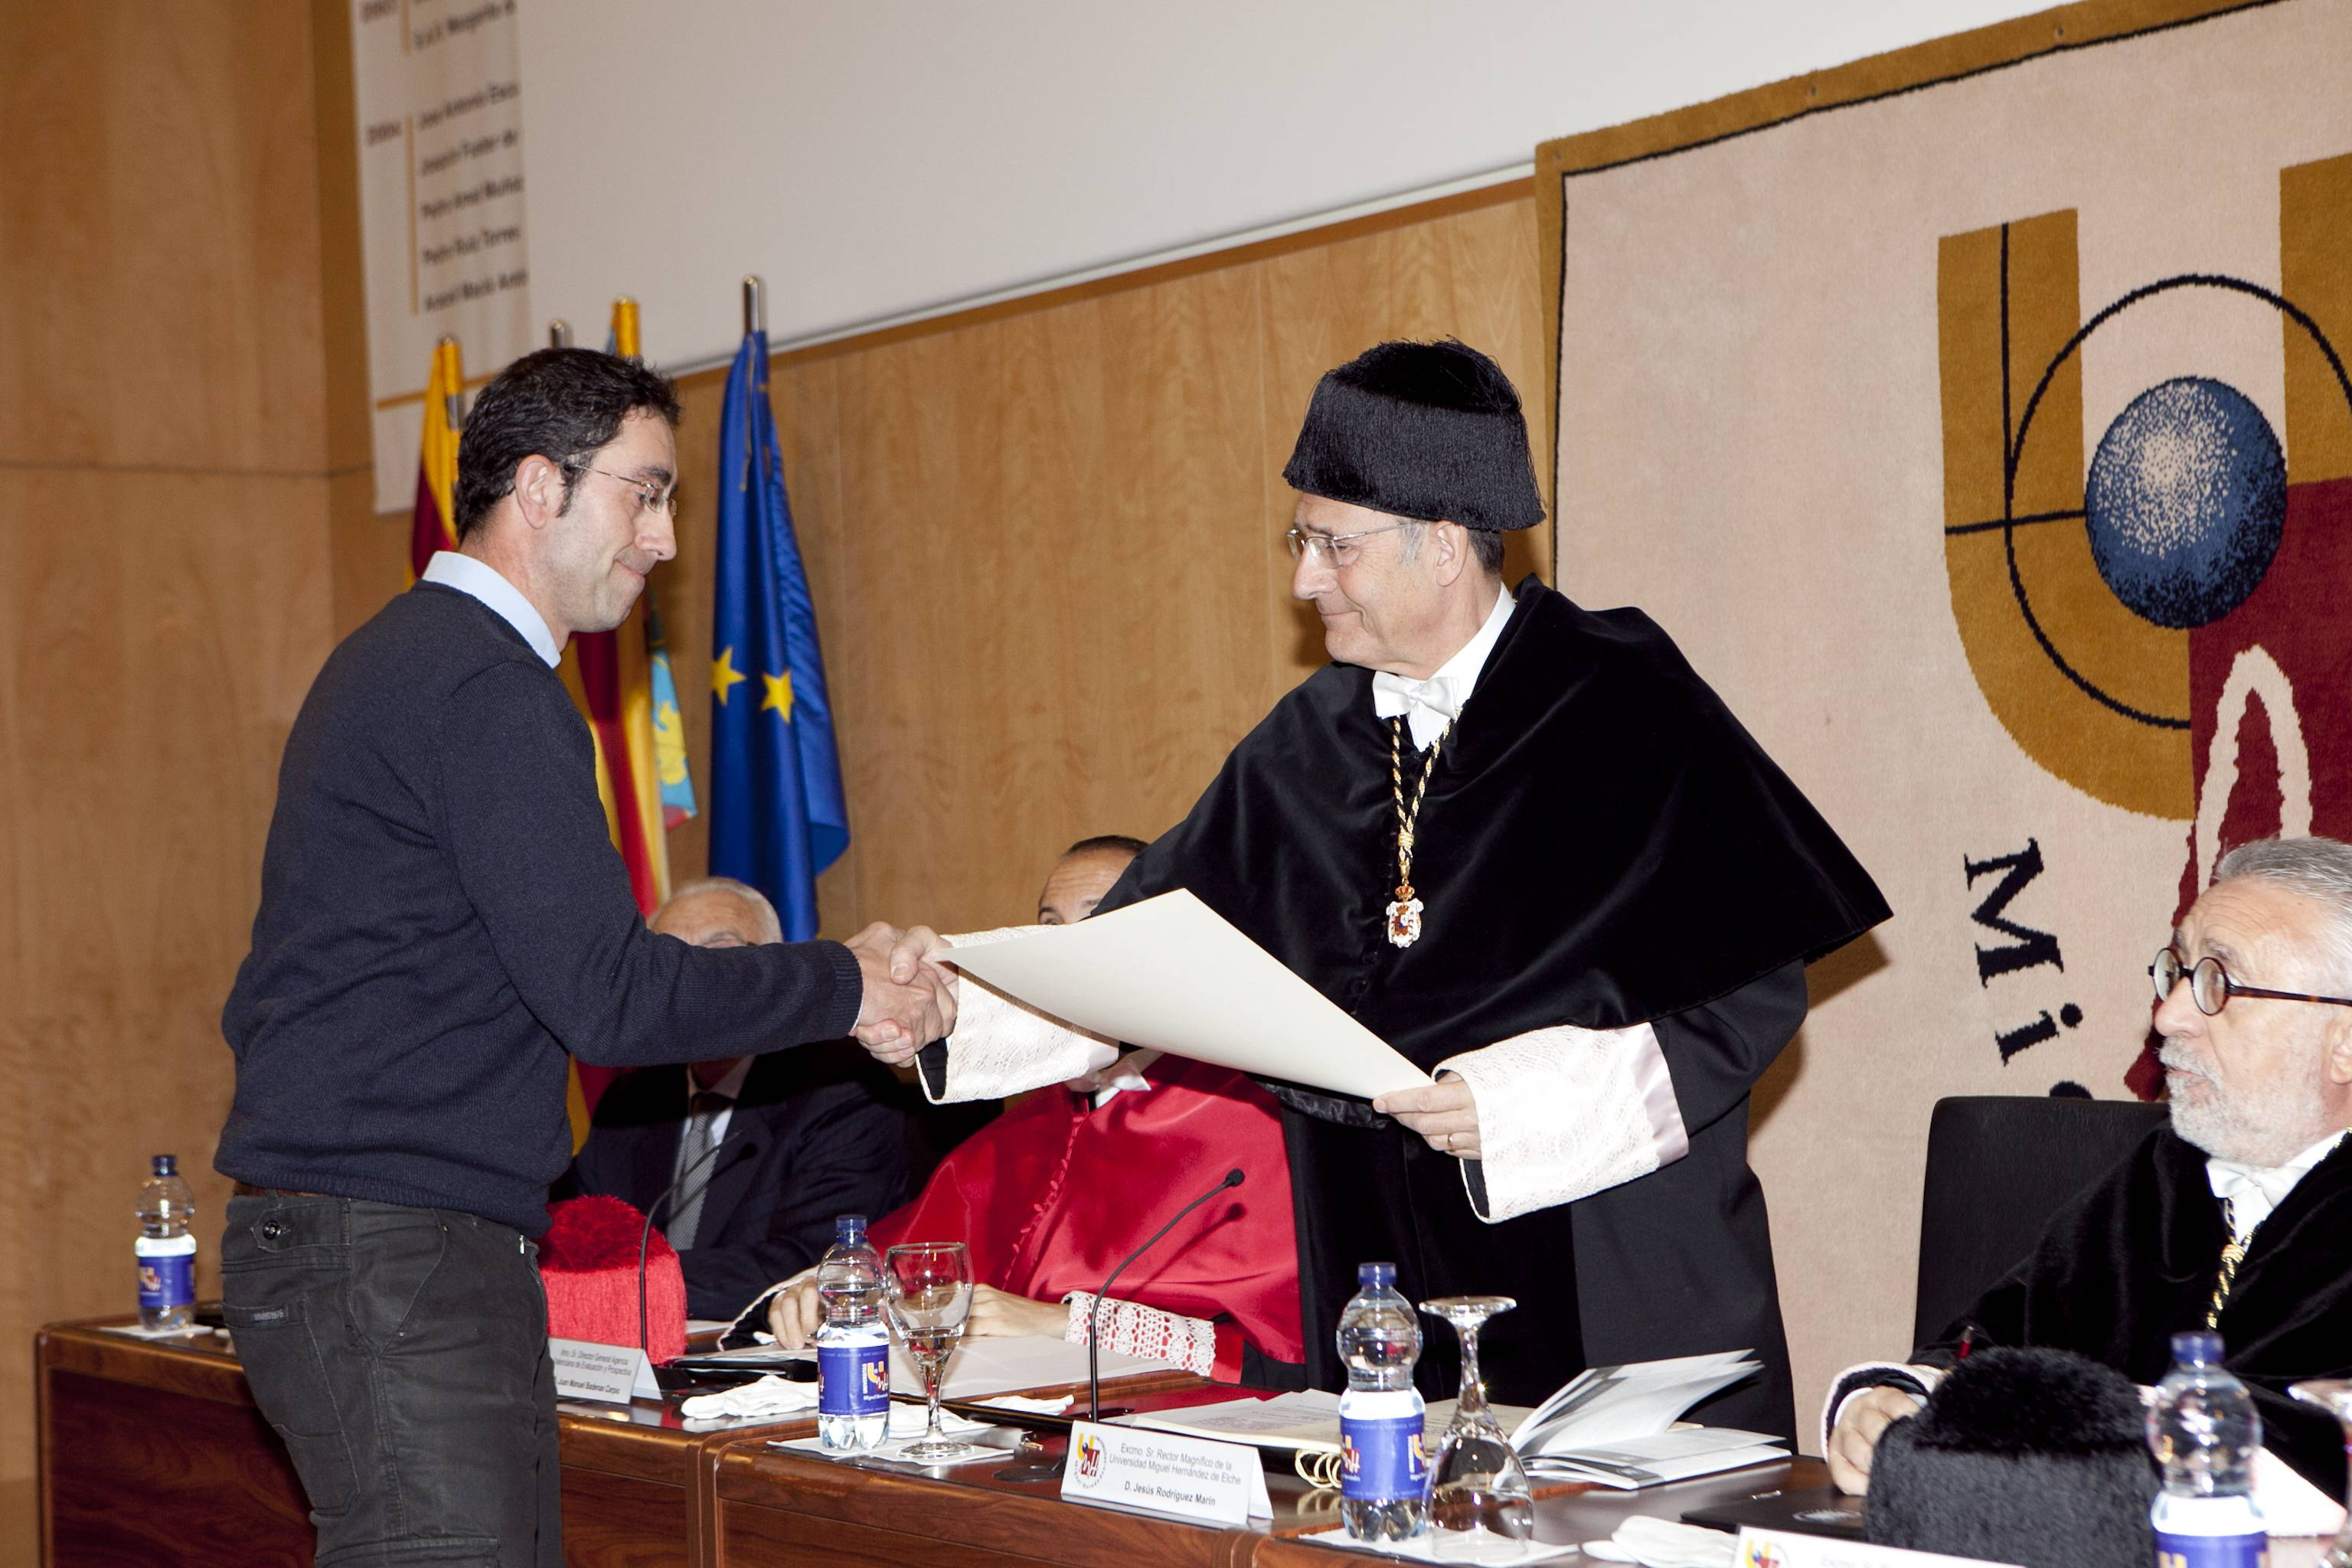 doctor-honoris-causa-luis-gamir_mg_0889.jpg